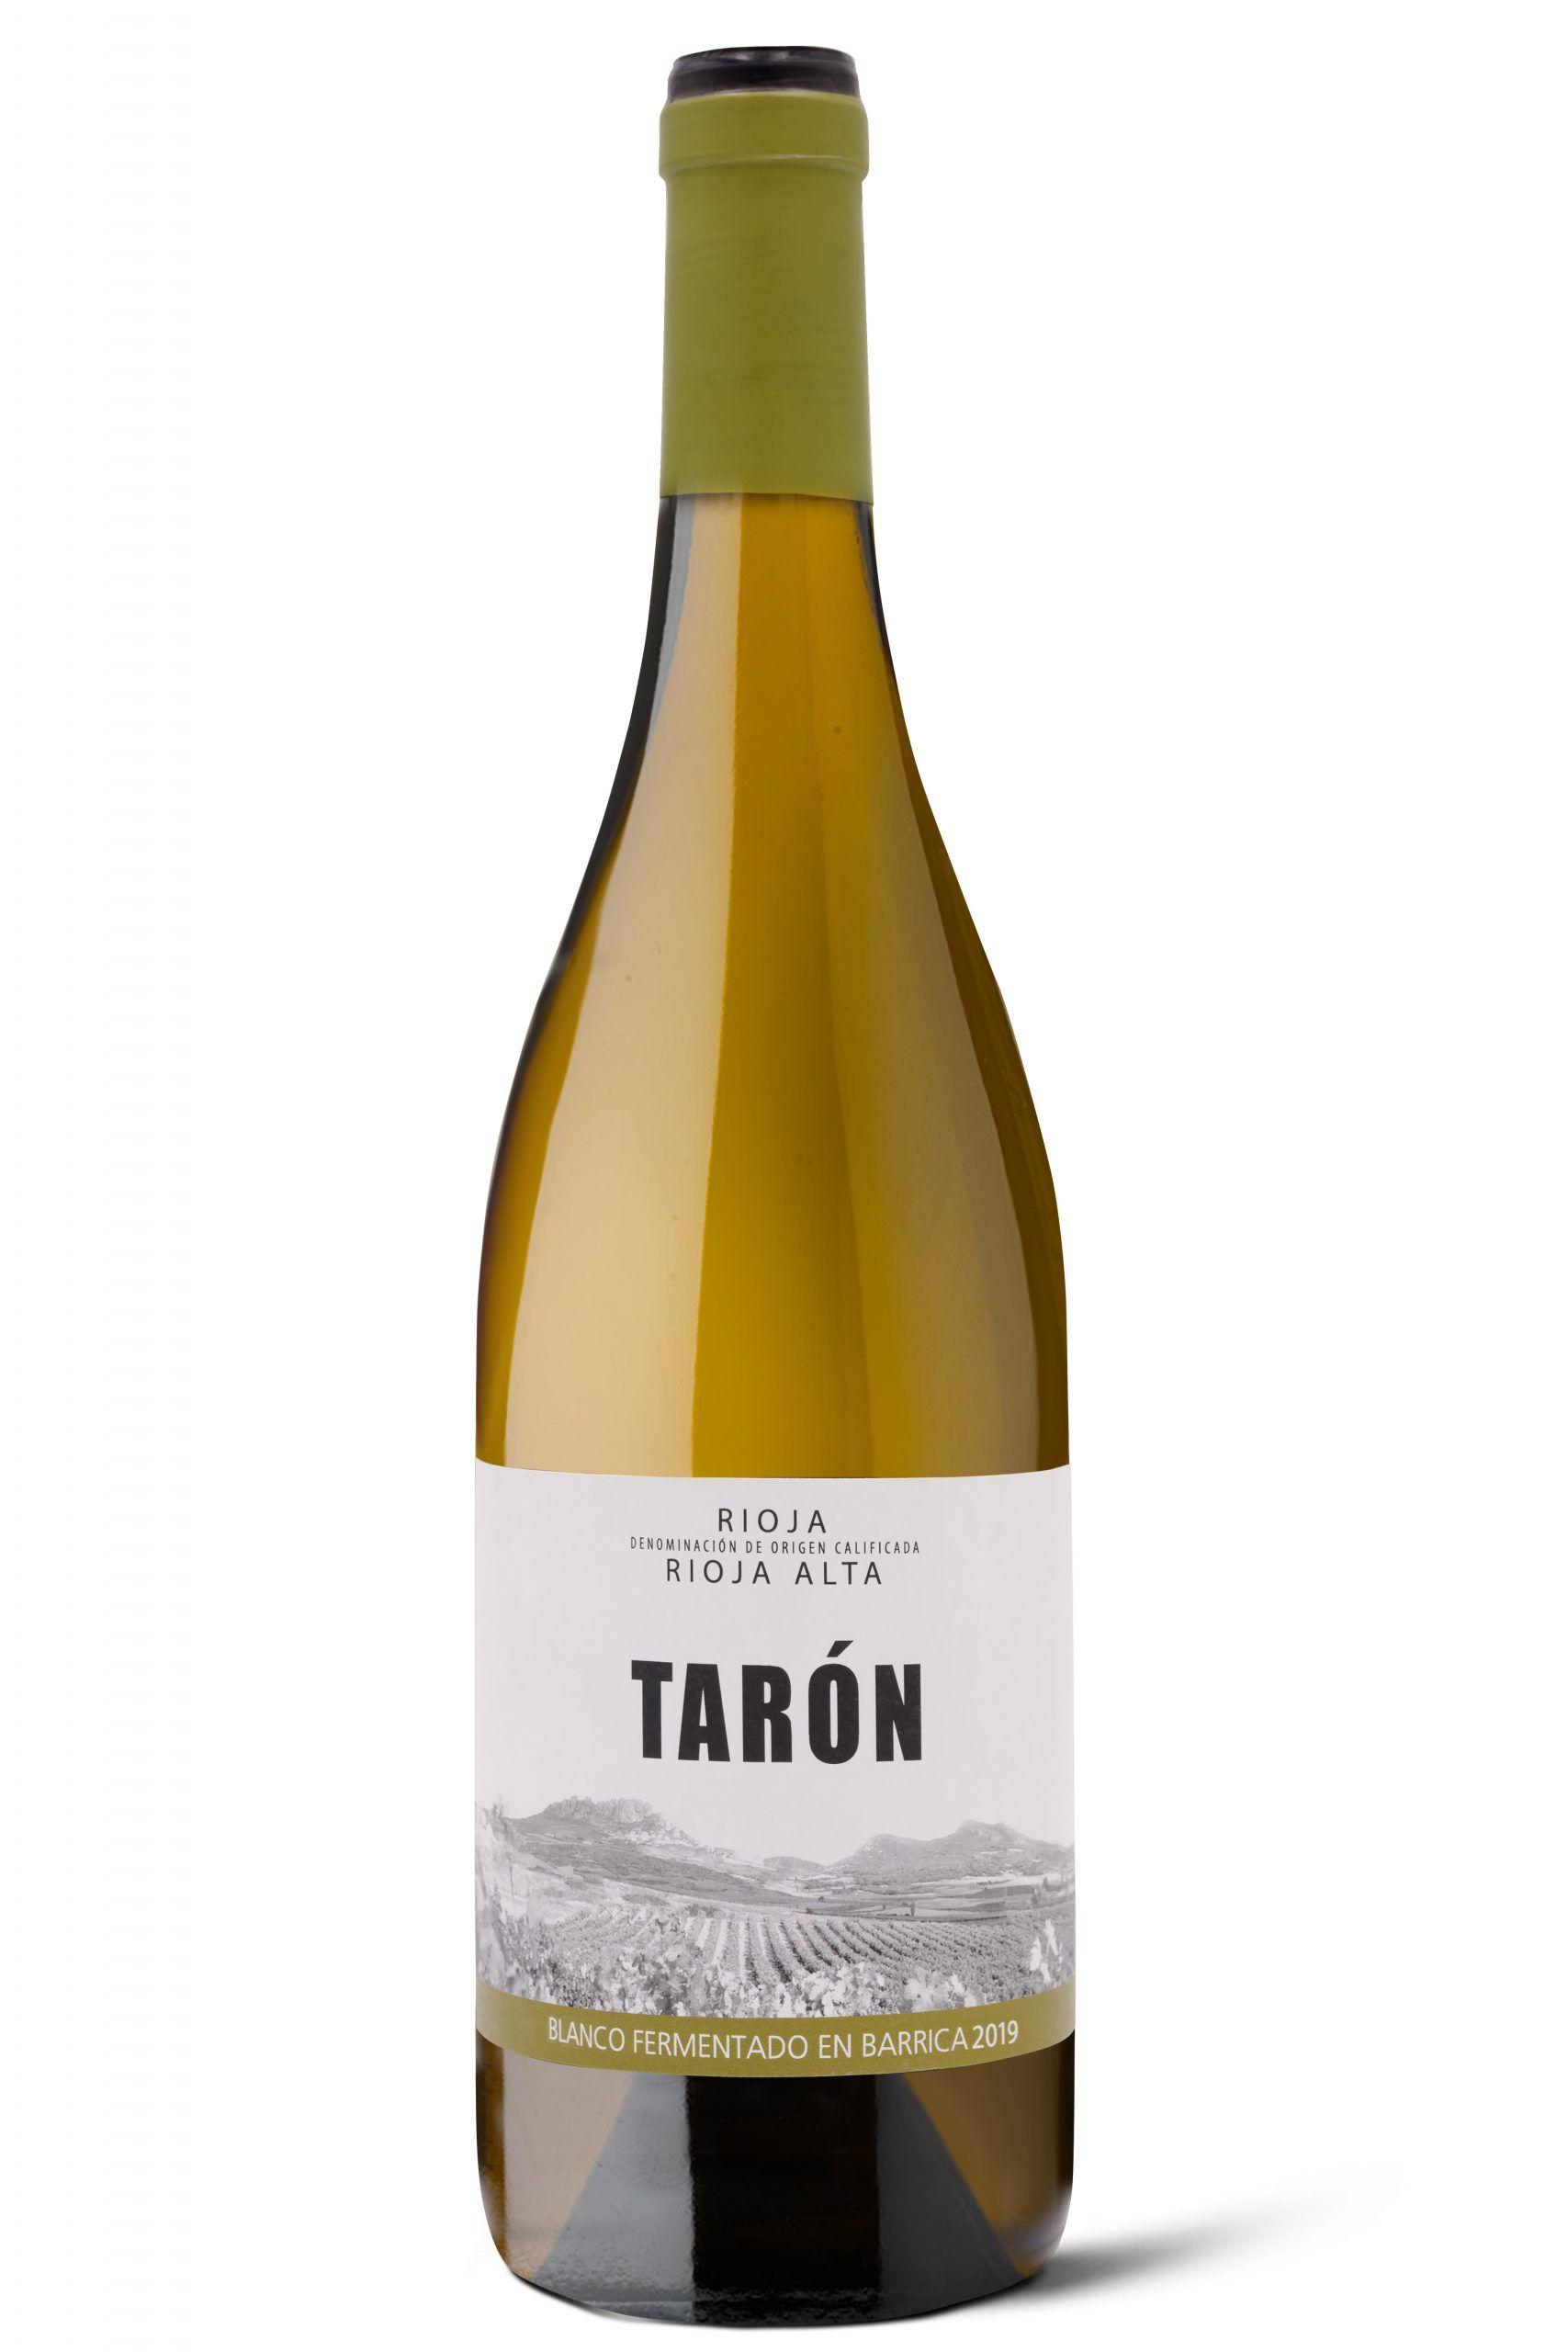 Tarón Barrel fermented white